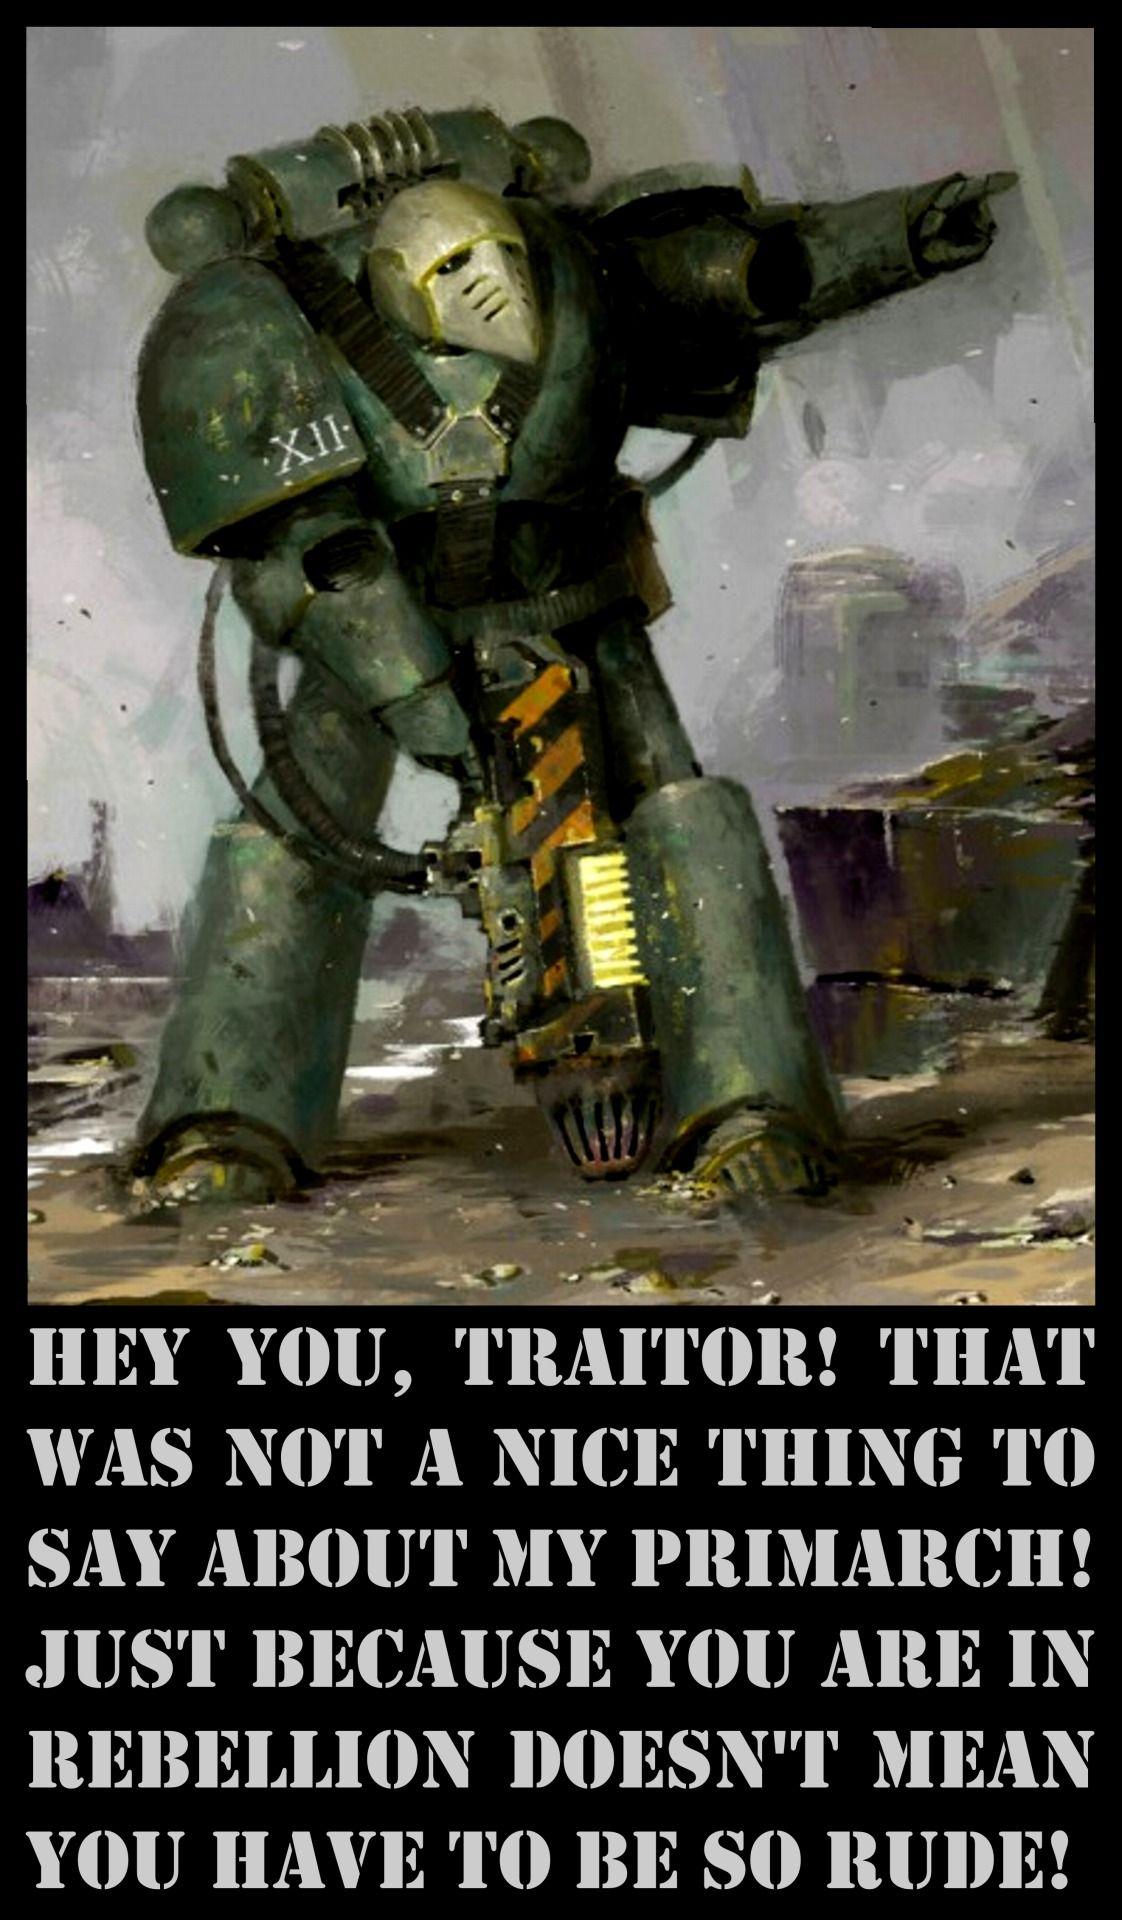 WARHAMMER 40K MEME - Google Search | Warhammer 40k memes ...